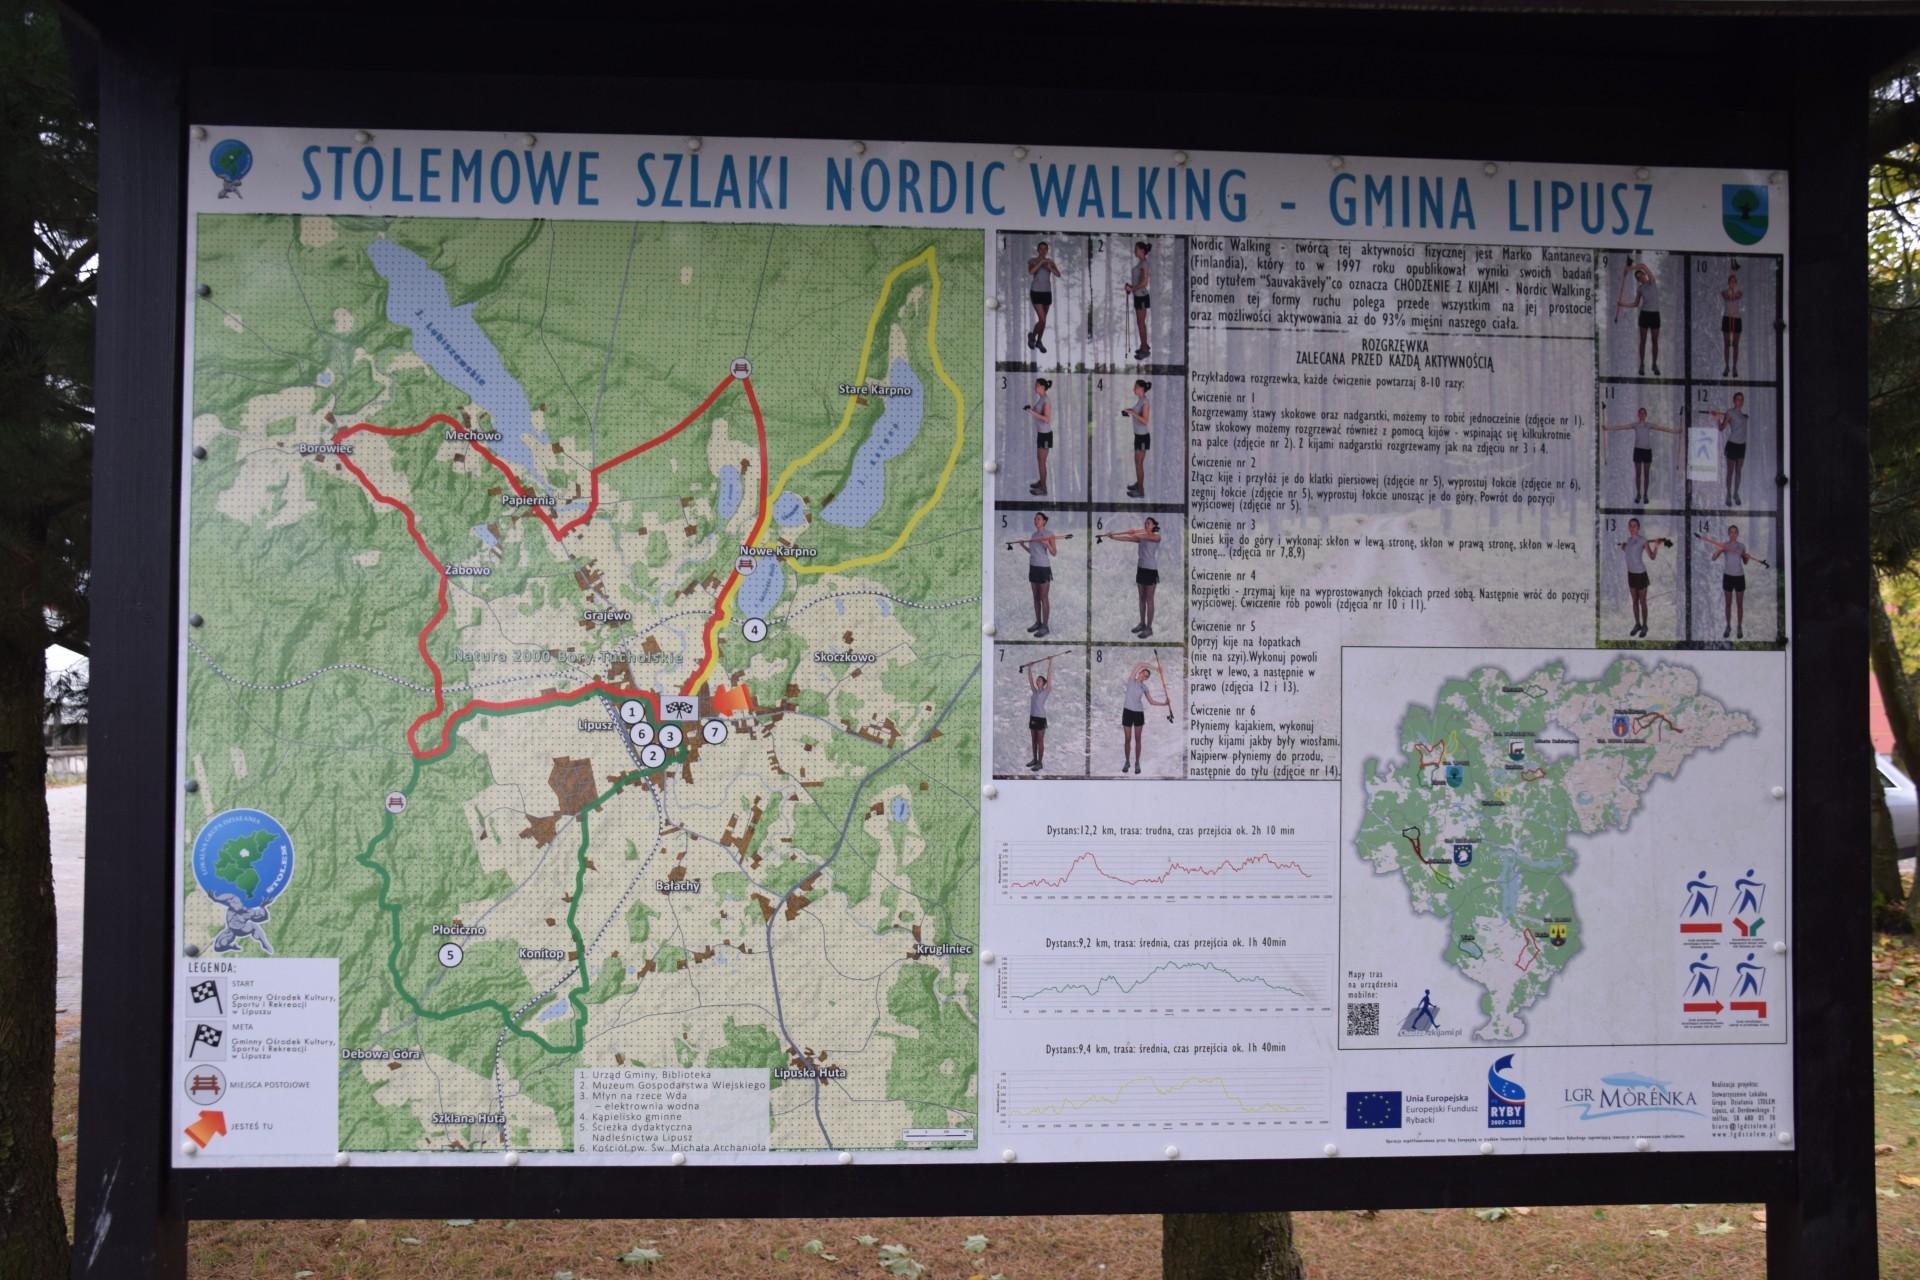 Stolemowe szlaki nordic walking Lipusz, źródło:Magazyn Kaszuby